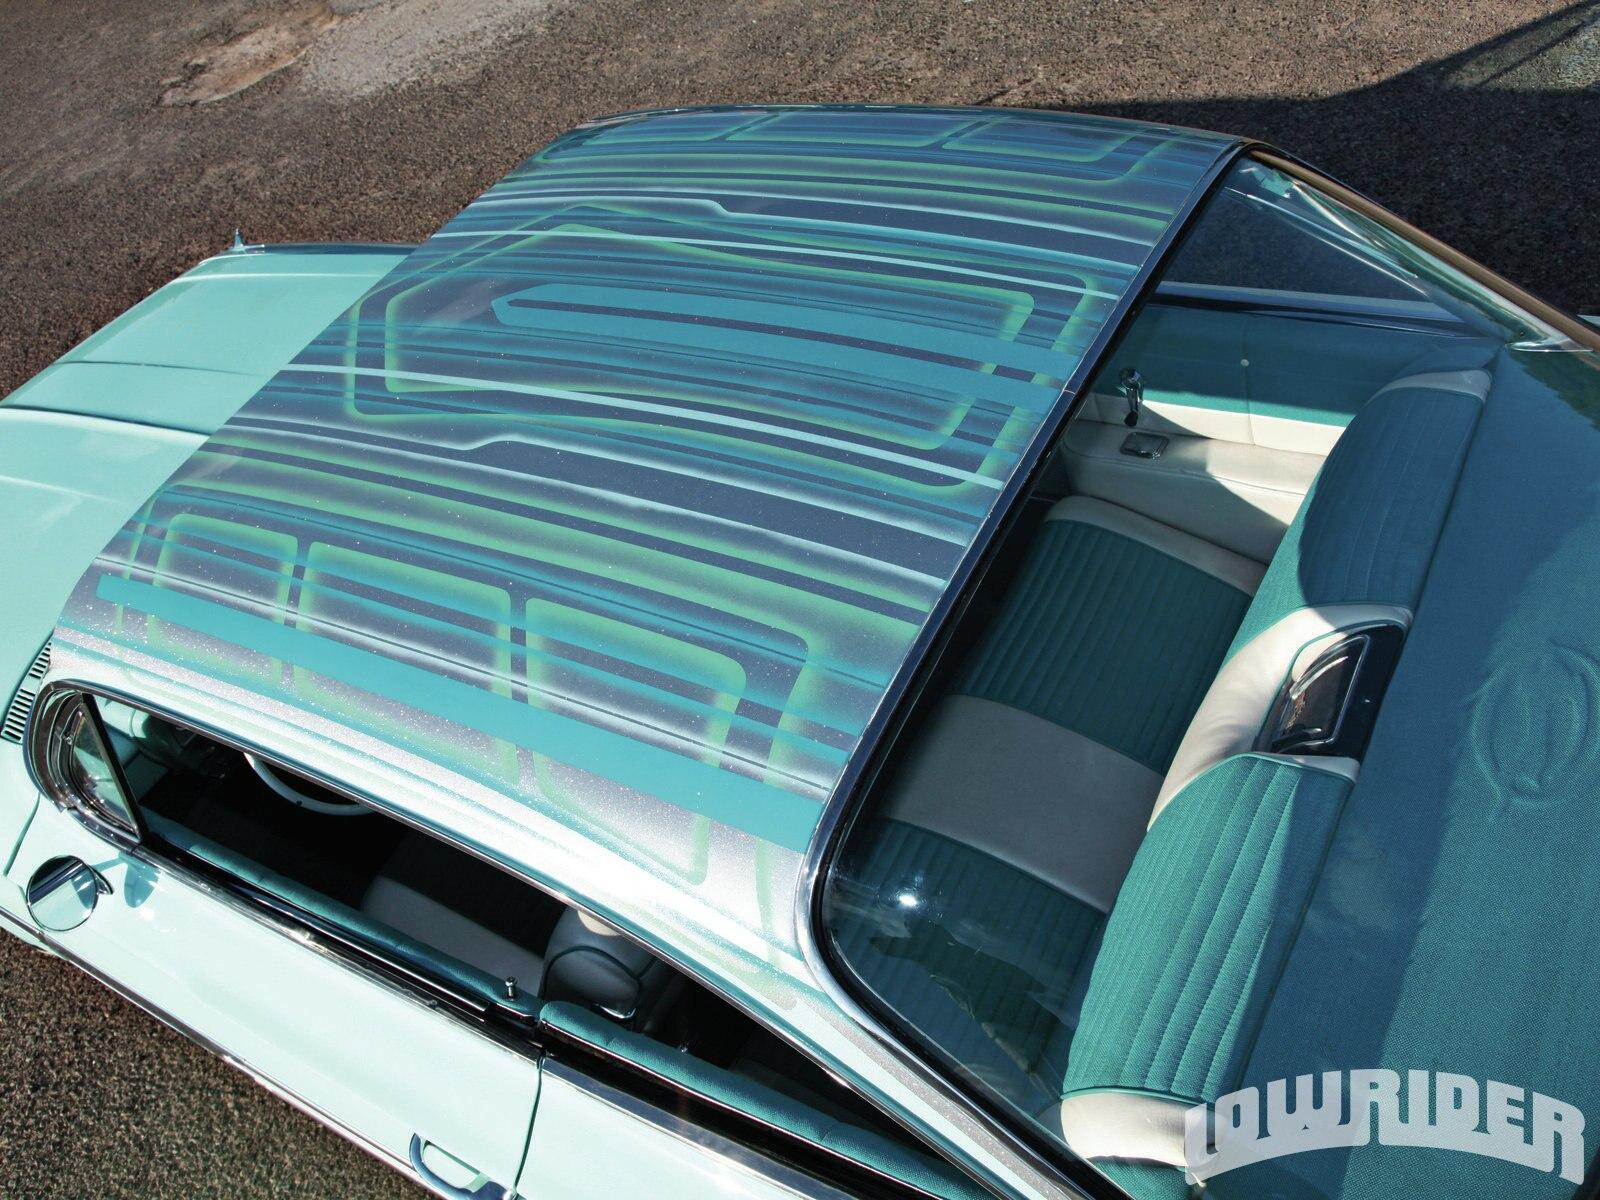 1961 chevrolet impala lowrider magazine. Black Bedroom Furniture Sets. Home Design Ideas